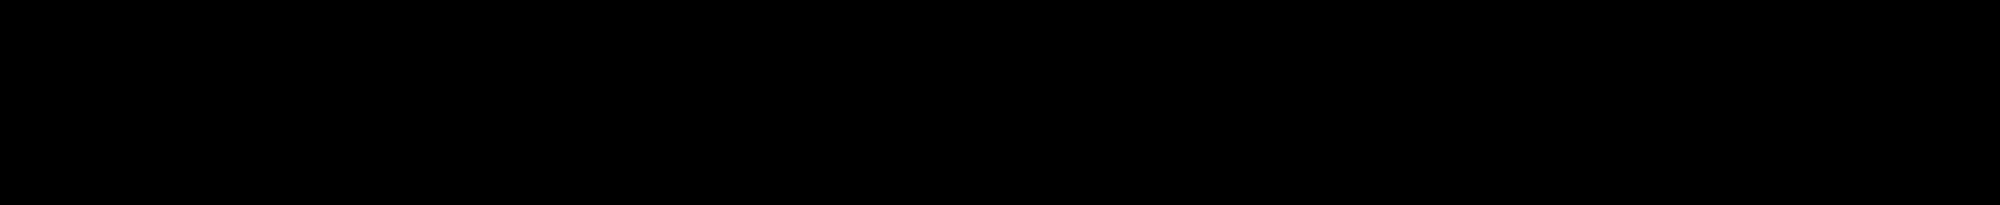 Hummer-logo-2000x205.png